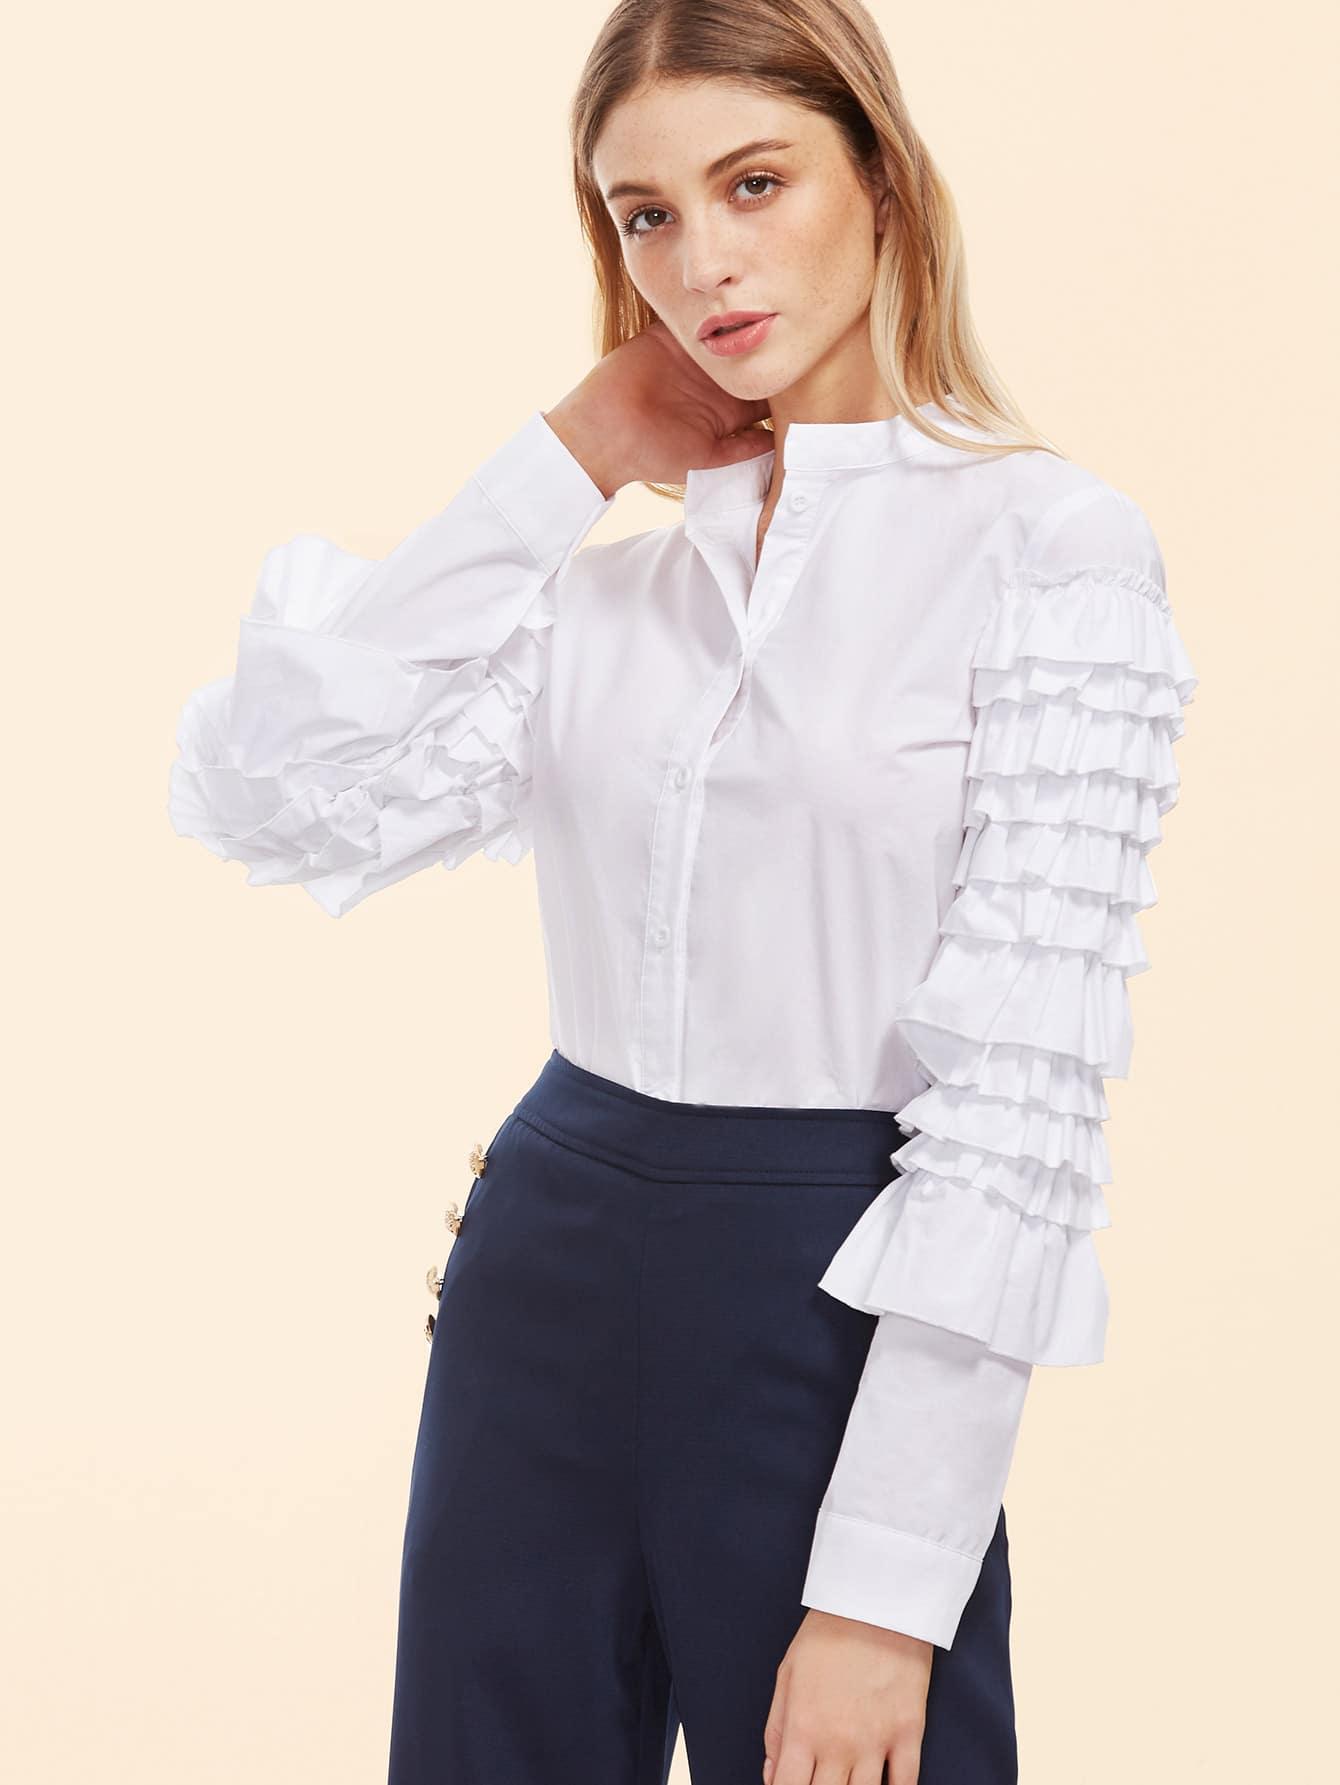 blouse161024705_2